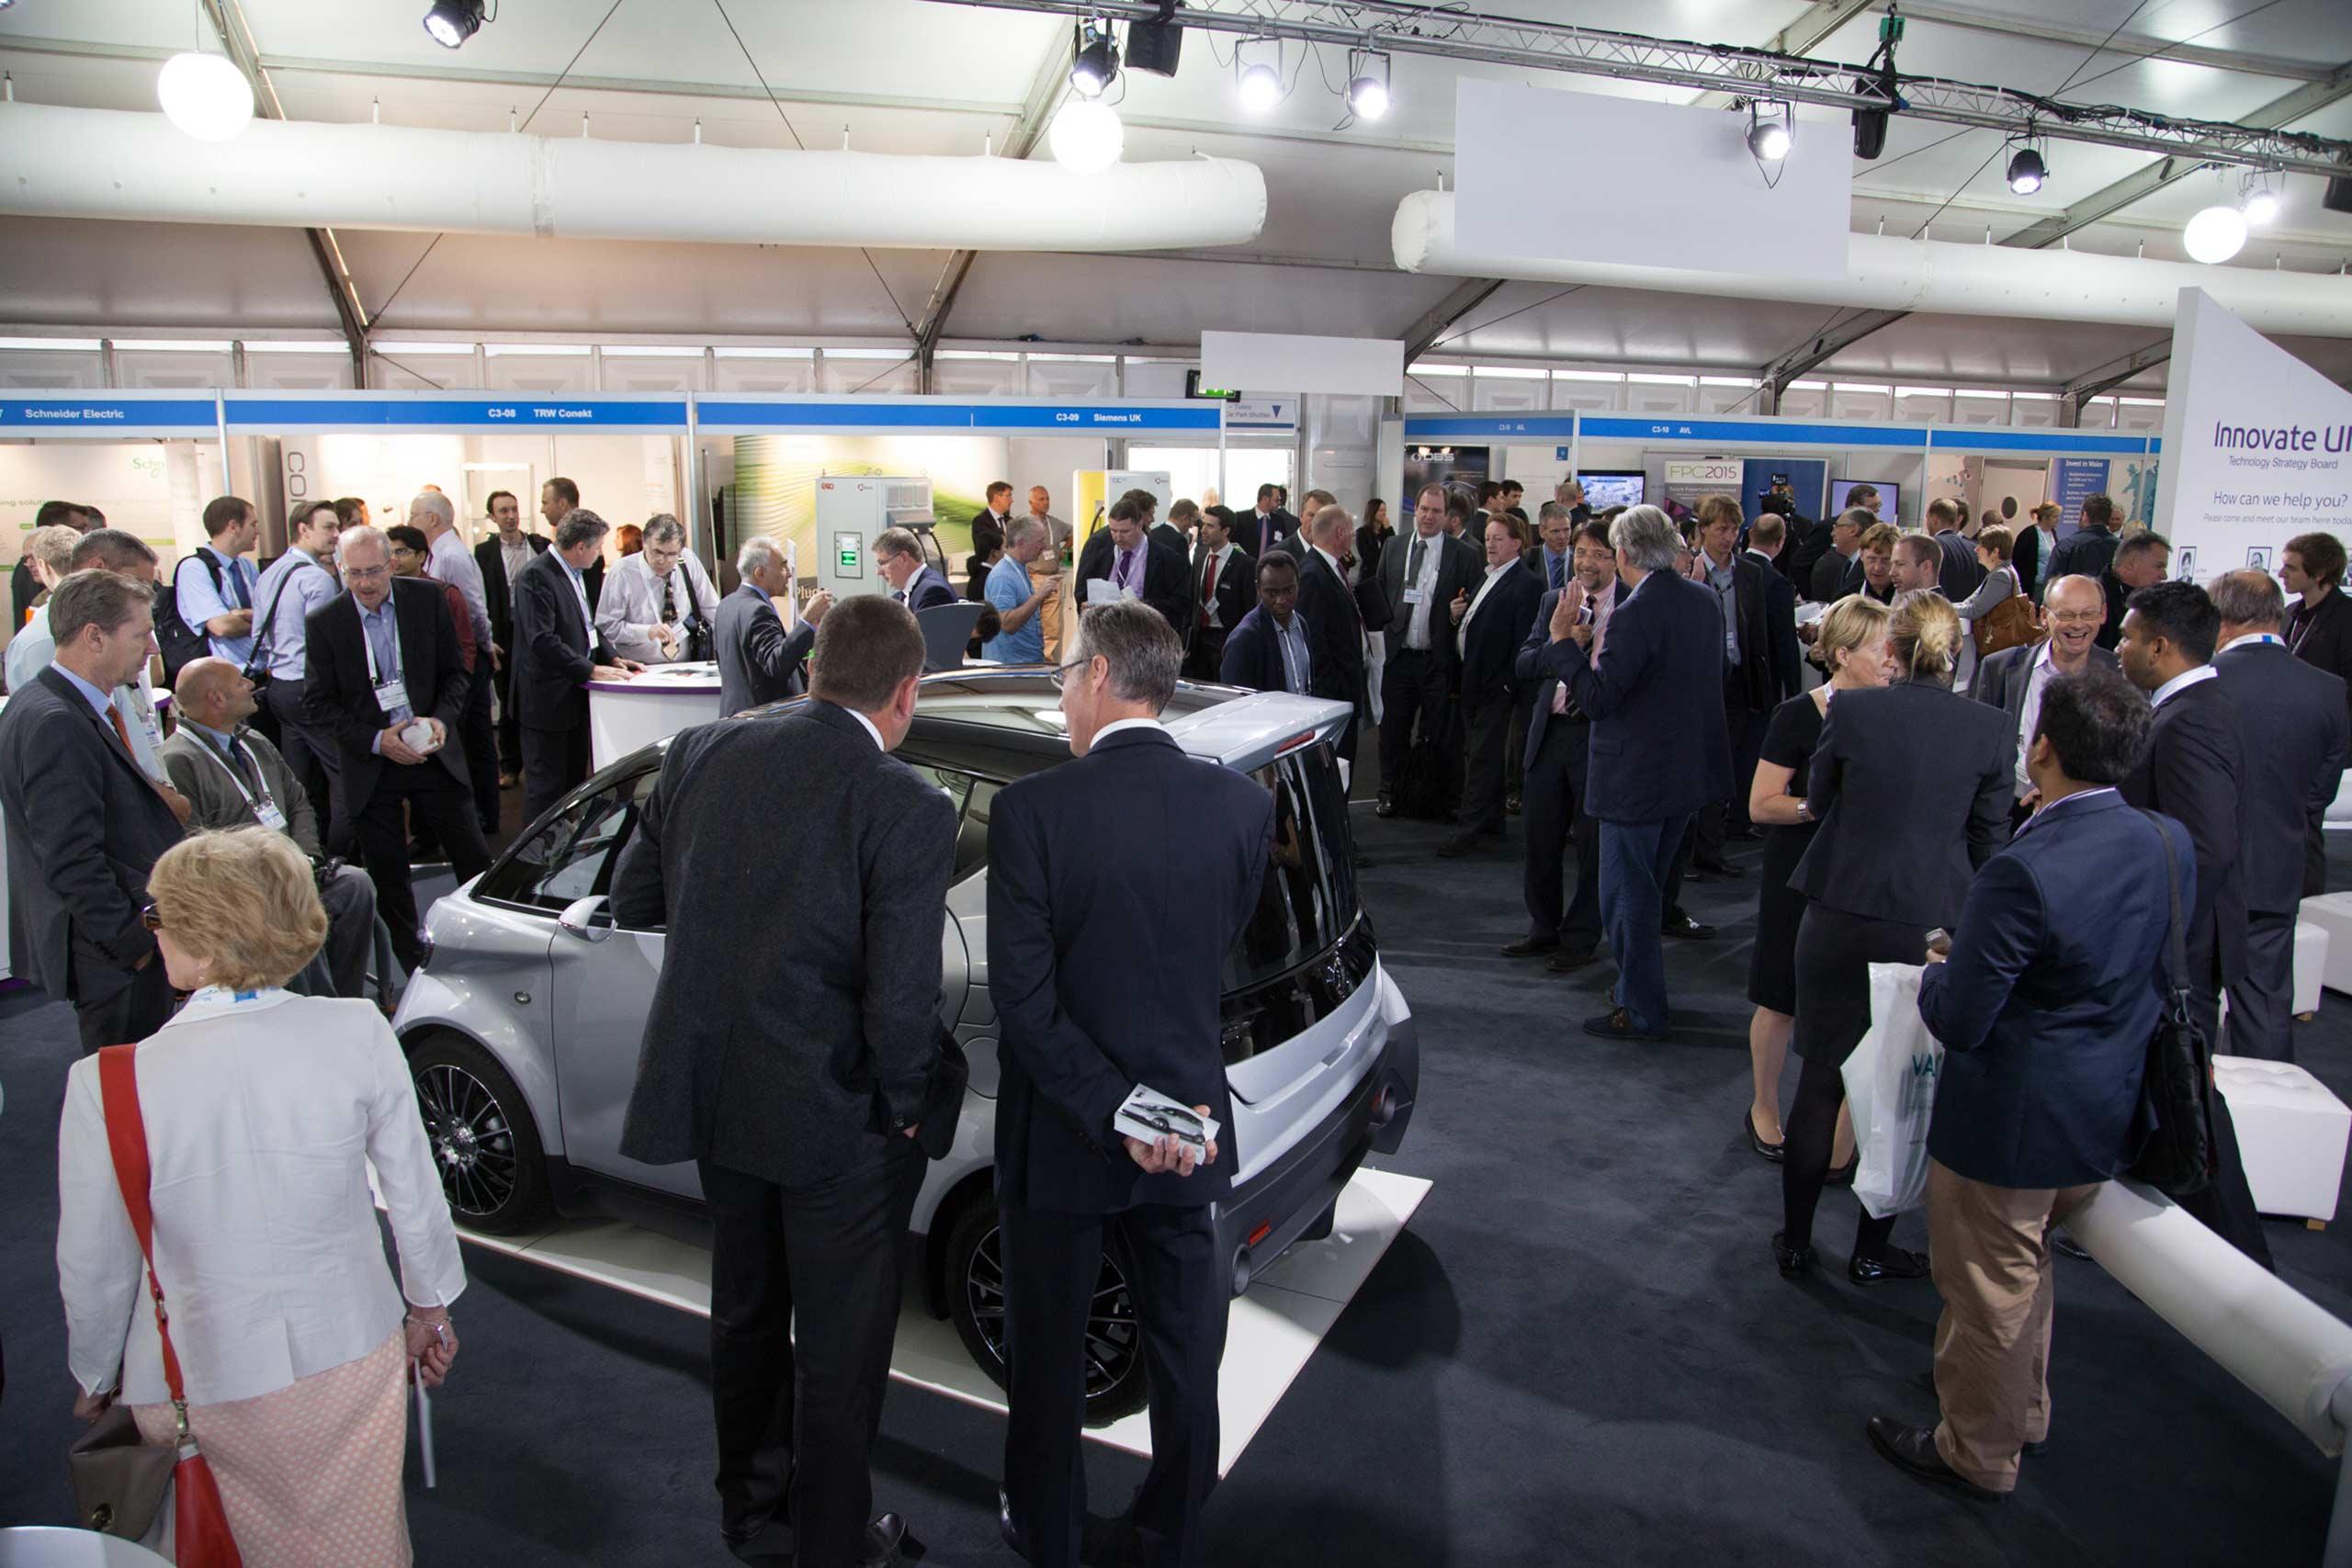 Low Carbon Vehicle Event 2016